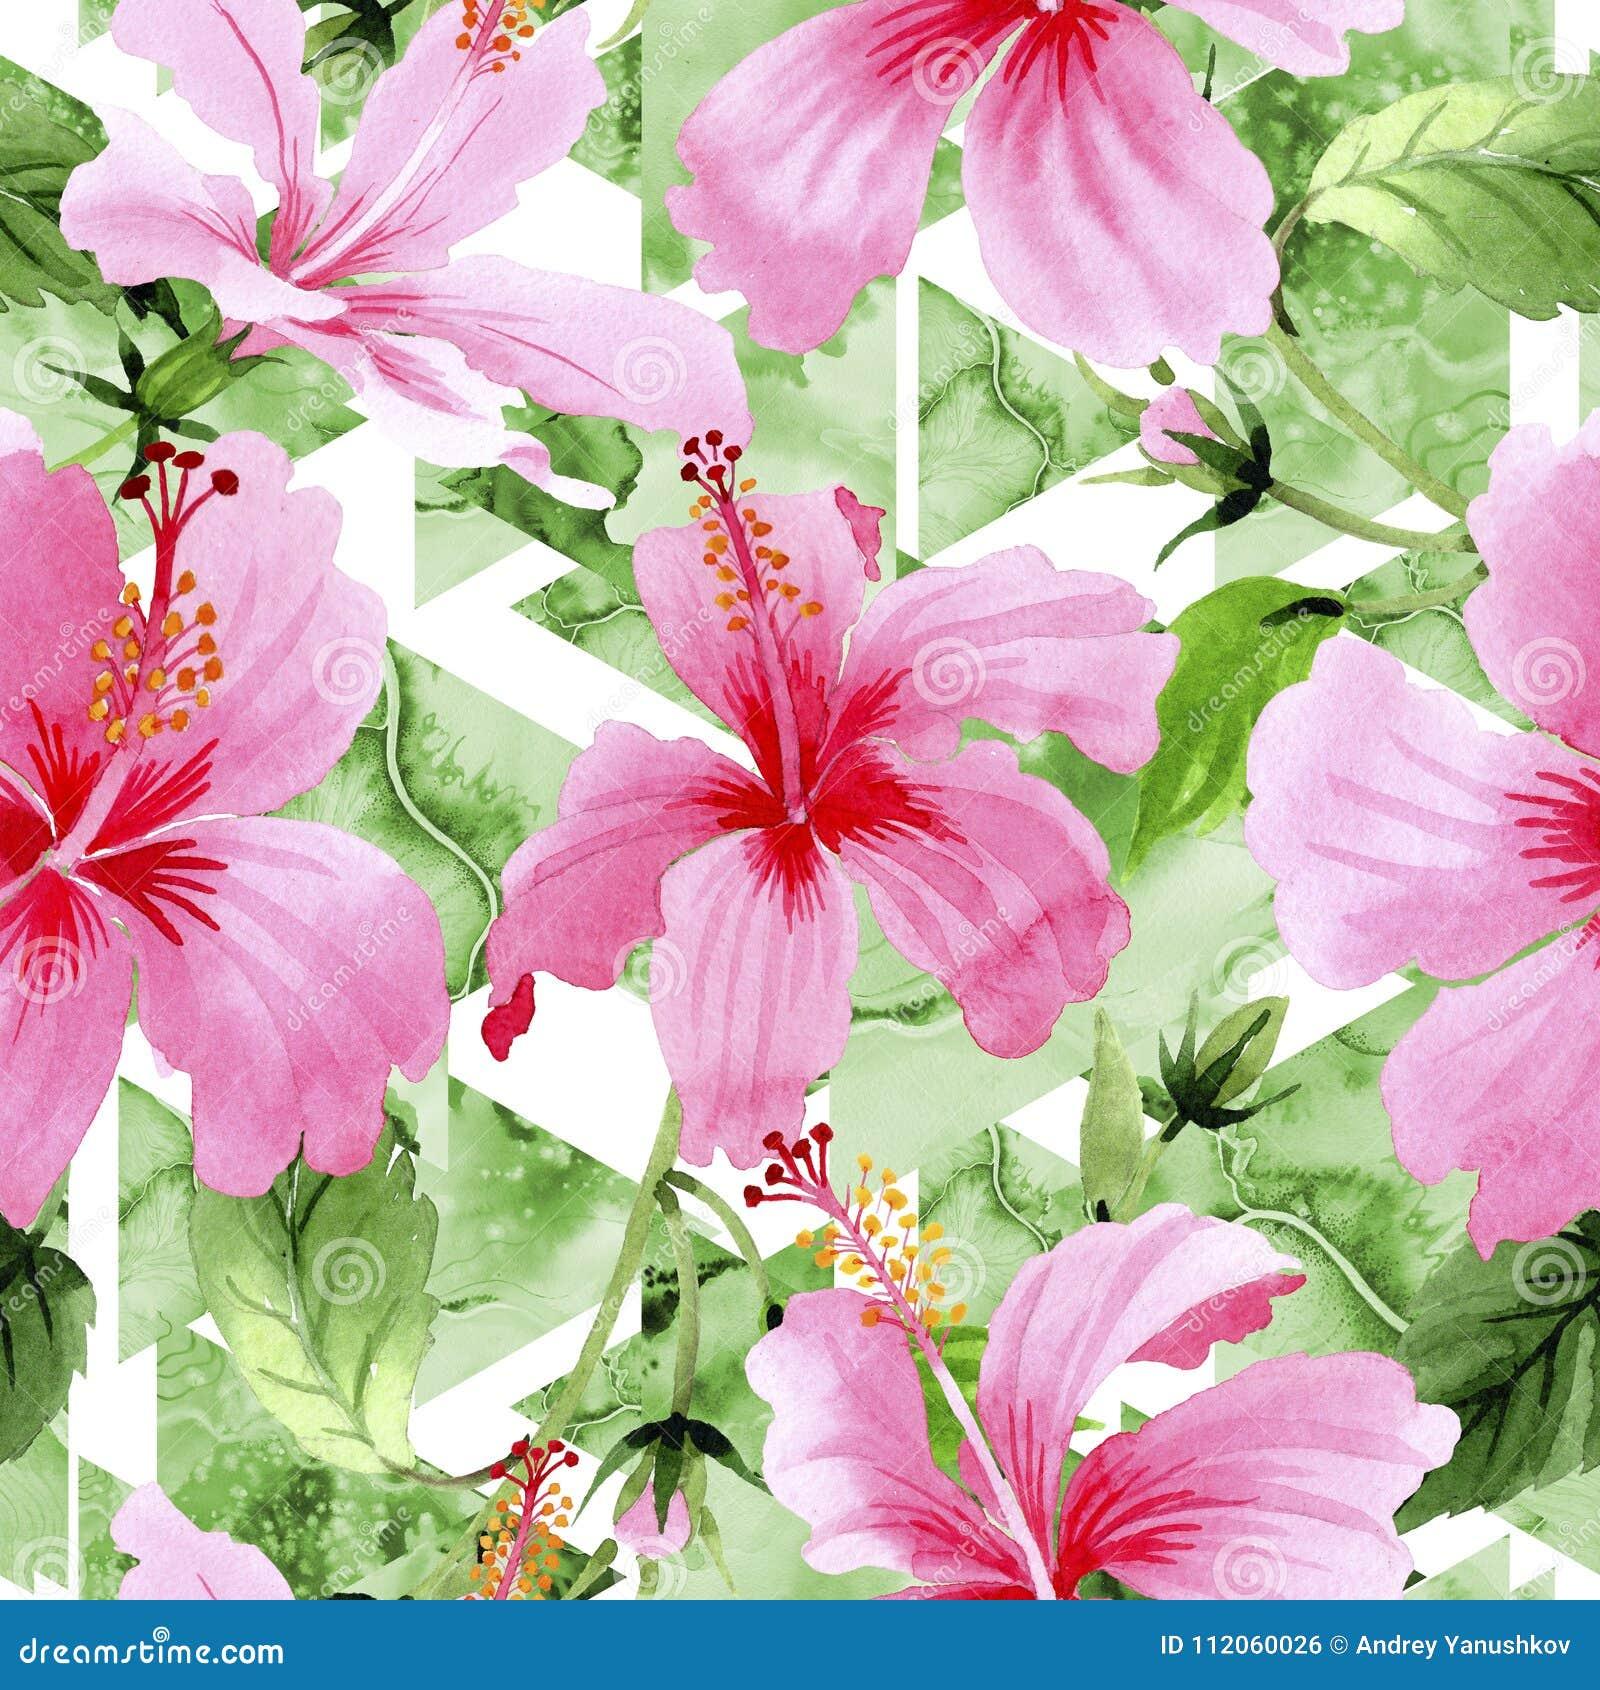 Wildflower hibiscus pink flower pattern in a watercolor style stock wildflower hibiscus pink flower pattern in a watercolor style full name of the plant hibiscus aquarelle wild flower for background texture izmirmasajfo